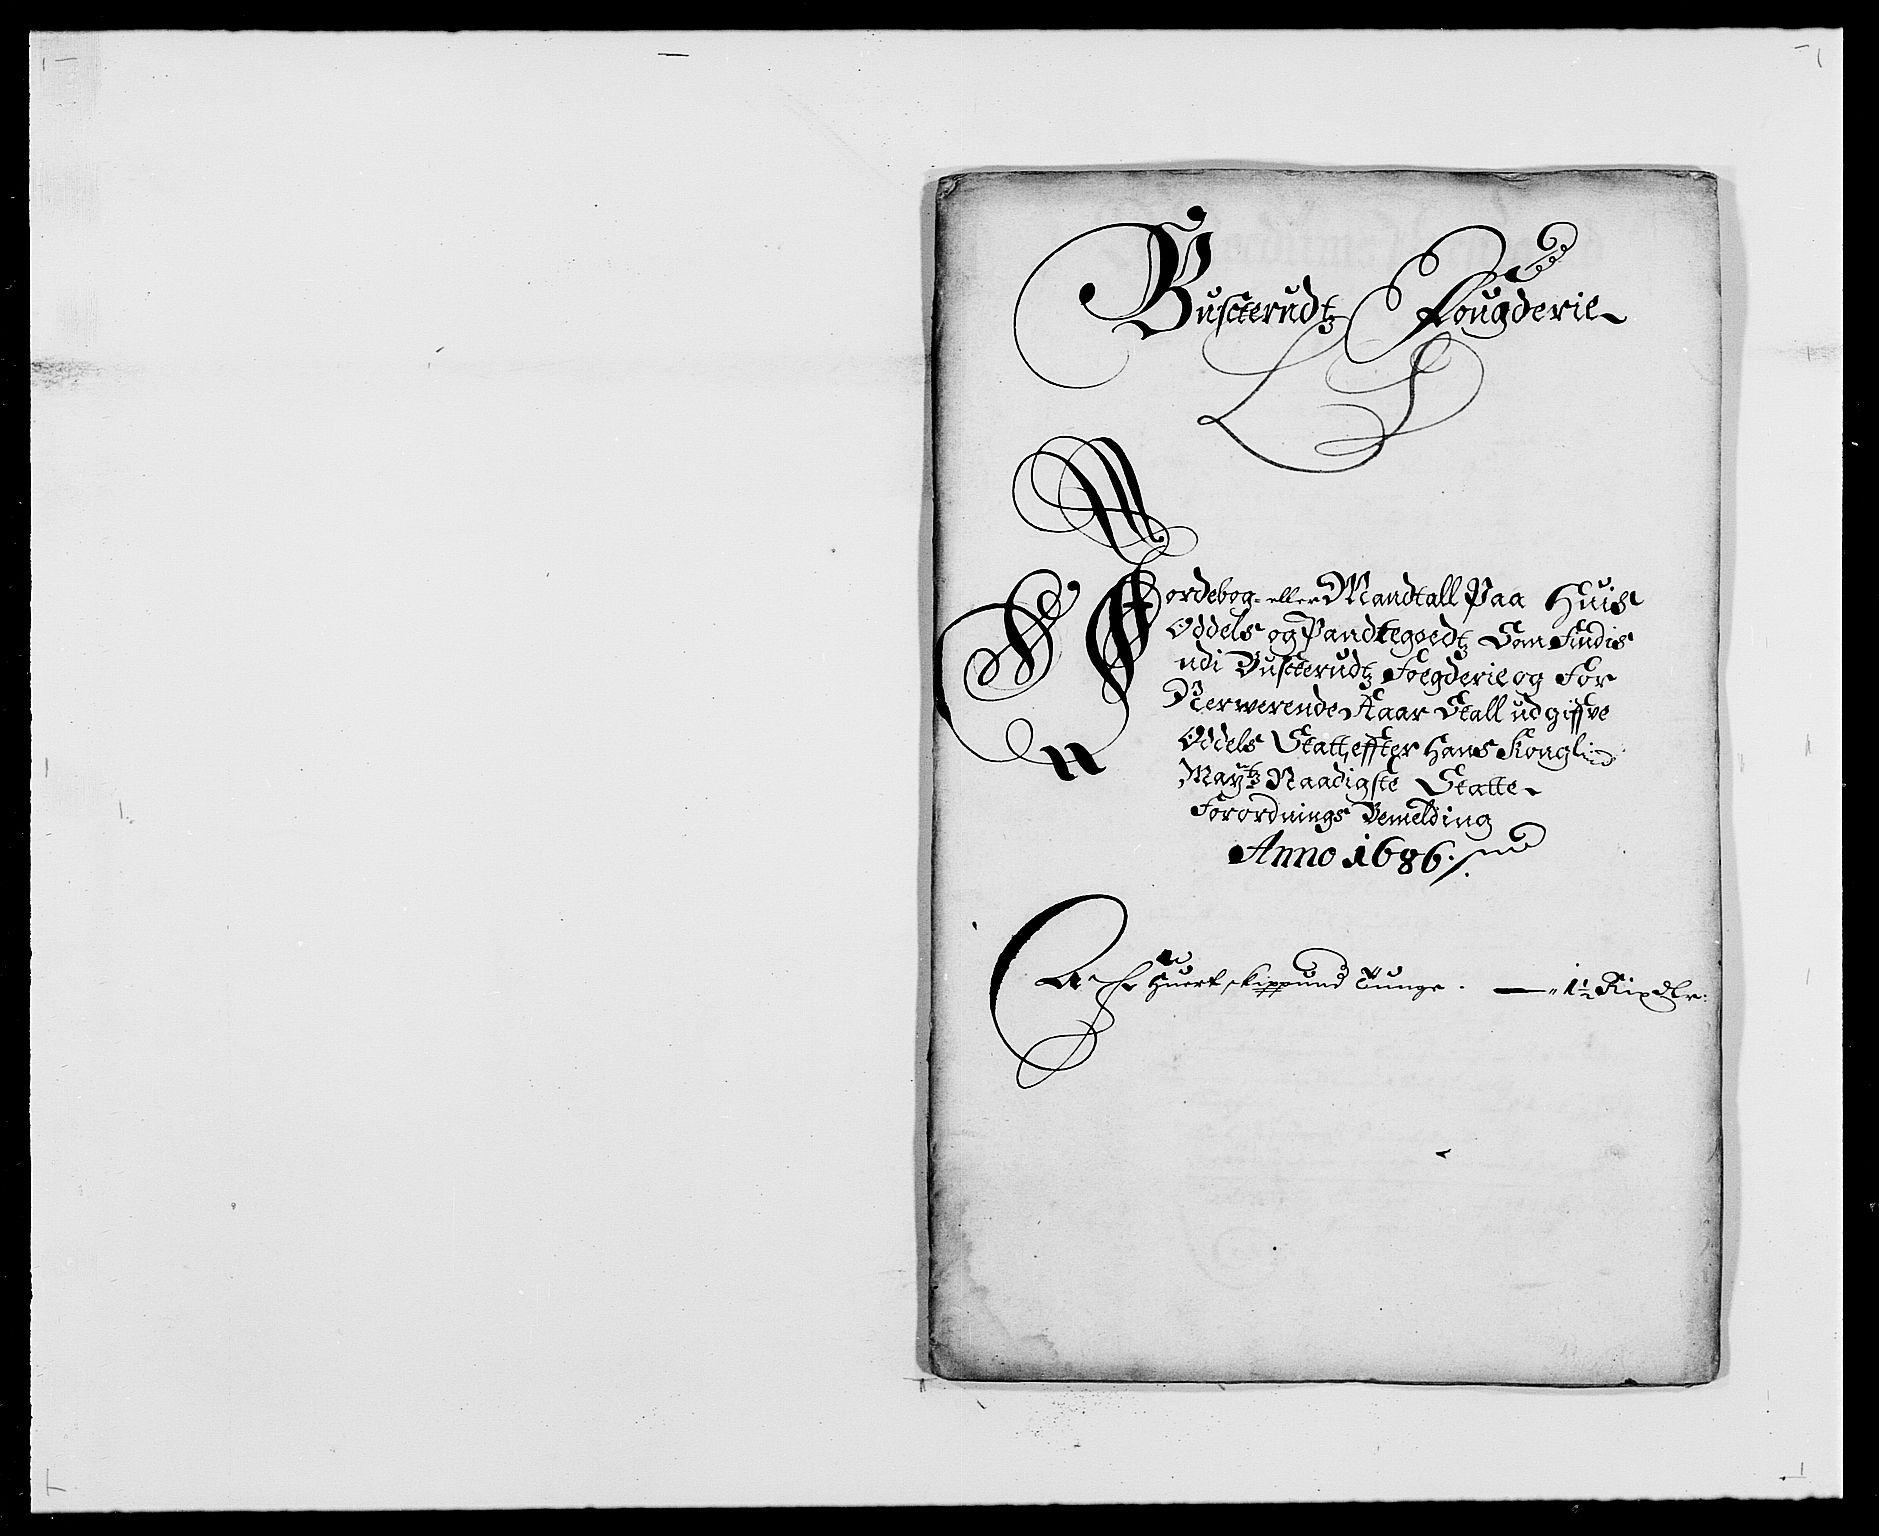 RA, Rentekammeret inntil 1814, Reviderte regnskaper, Fogderegnskap, R25/L1678: Fogderegnskap Buskerud, 1685-1686, s. 309